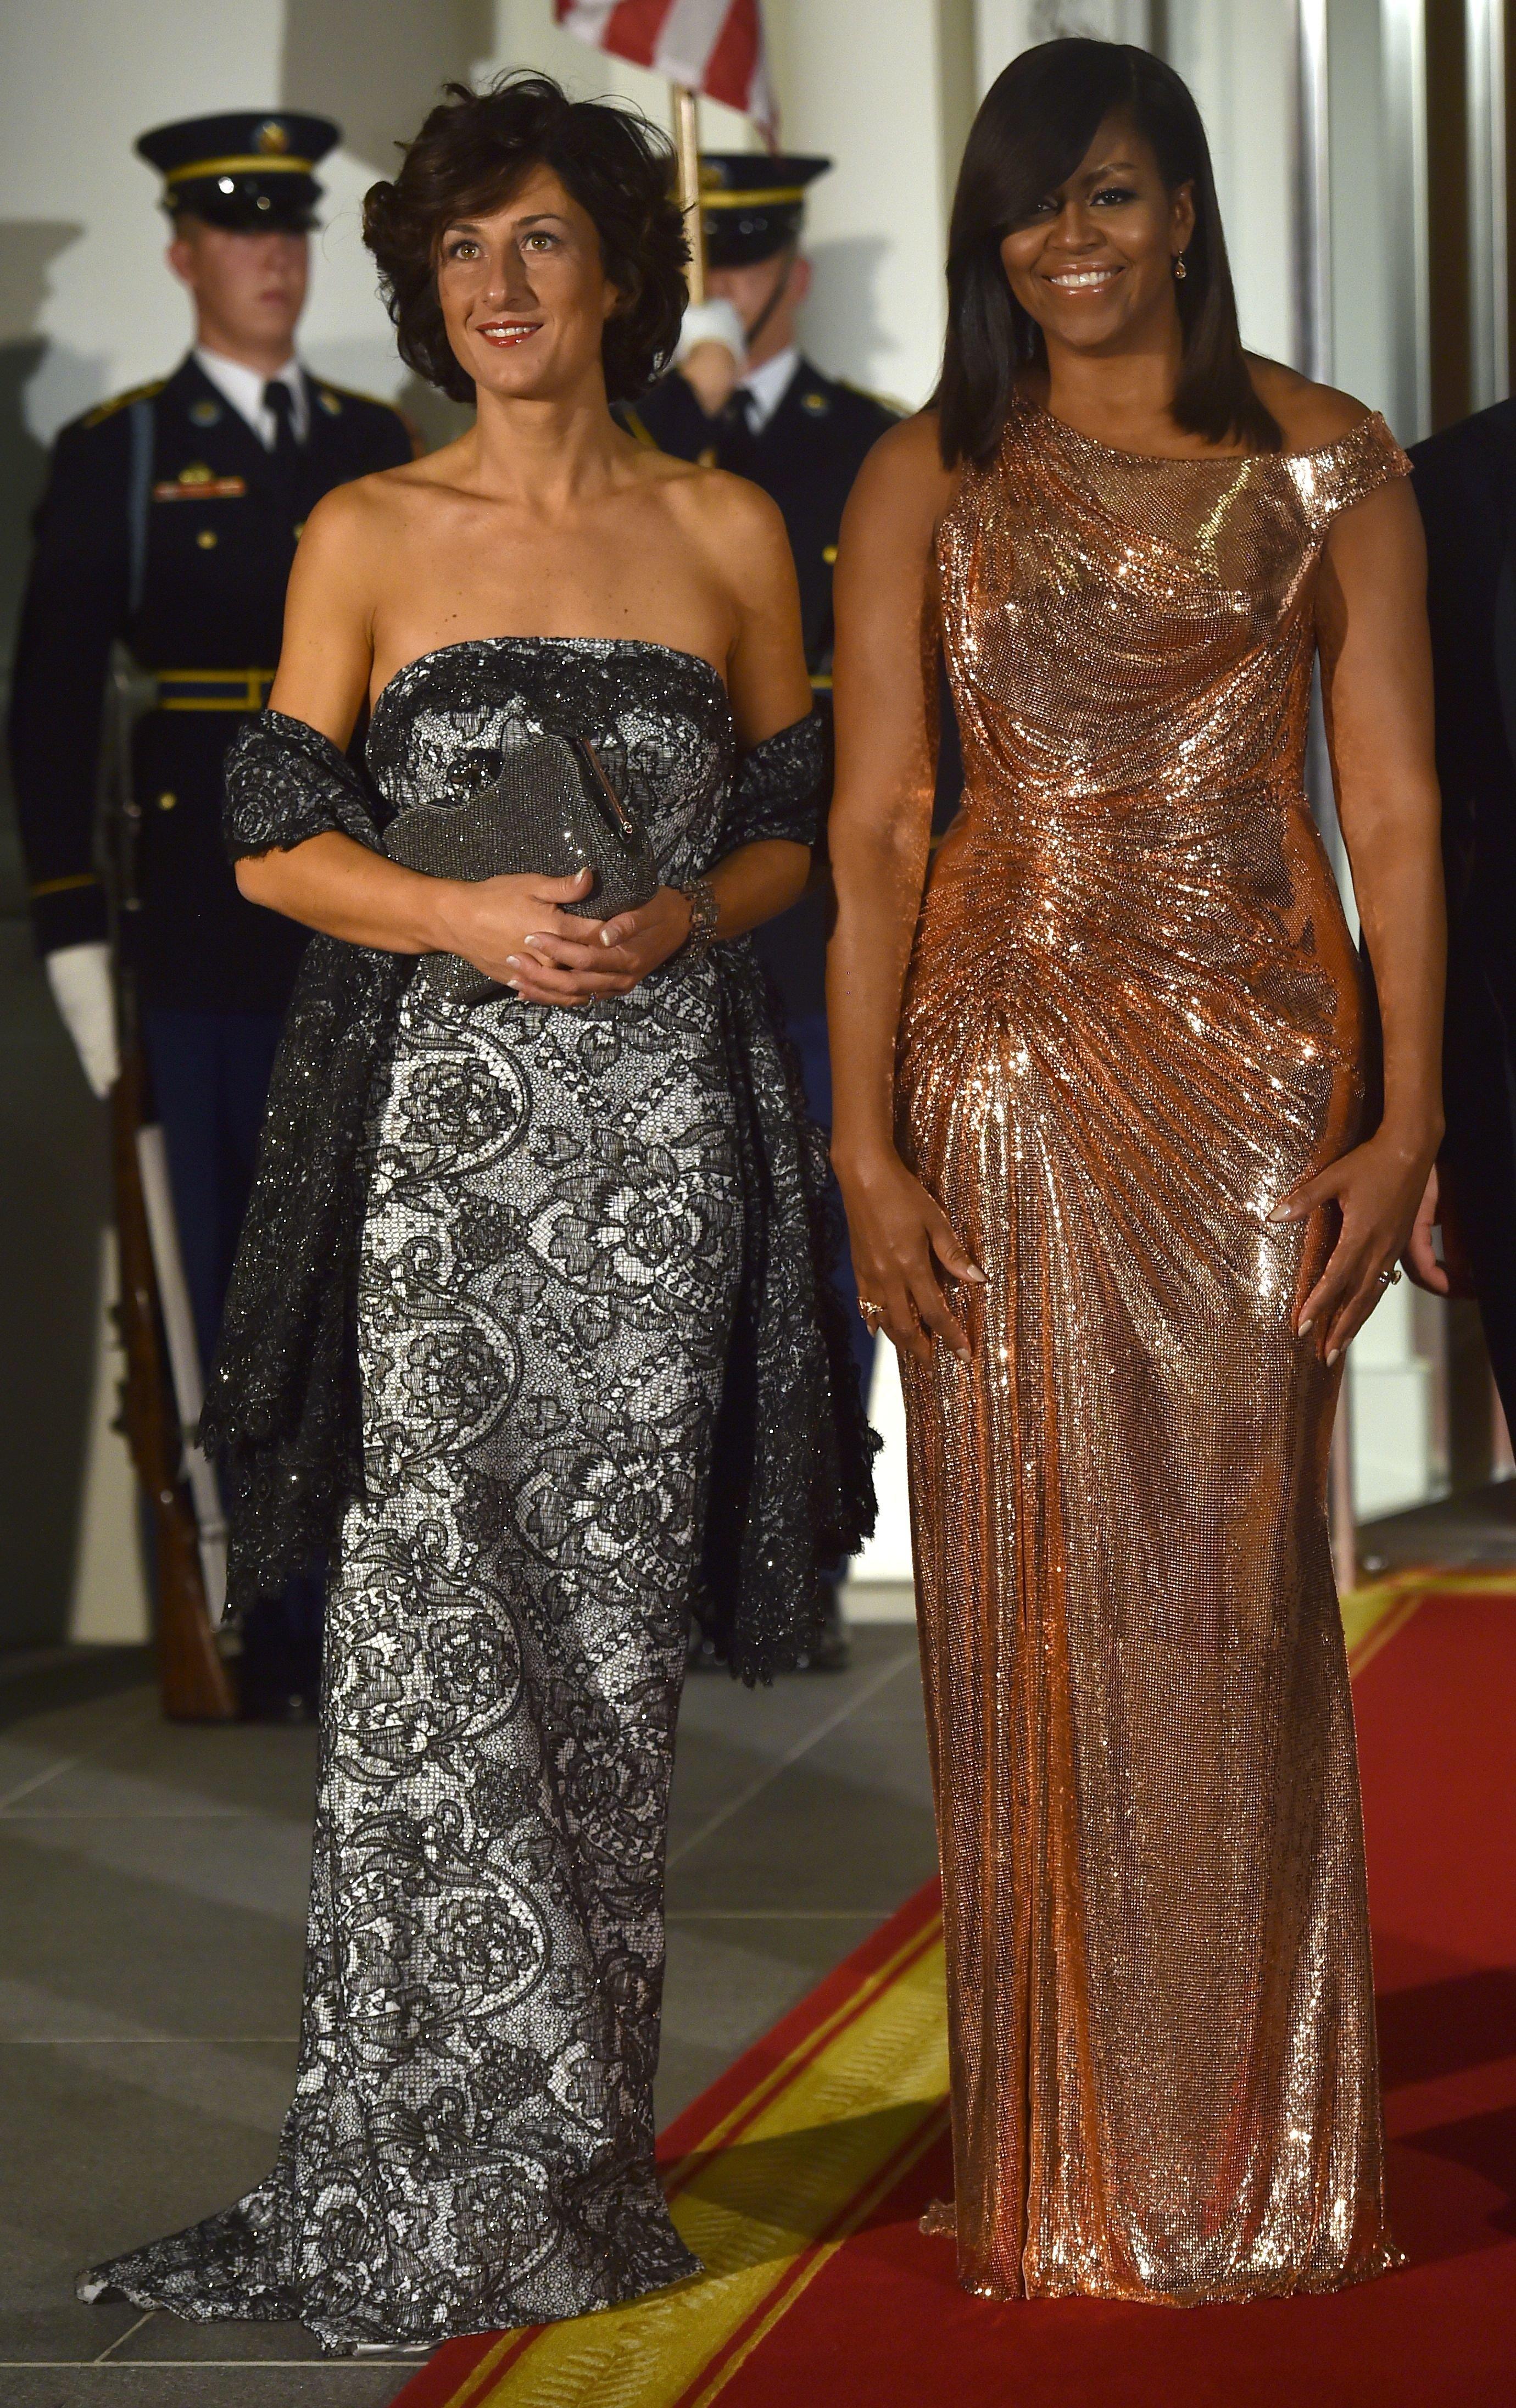 "<a href=""http://www.huffingtonpost.com/entry/michelle-obama-state-dinner_us_5806105be4b0180a36e61feb?utm_hp_ref=michelle-obam"